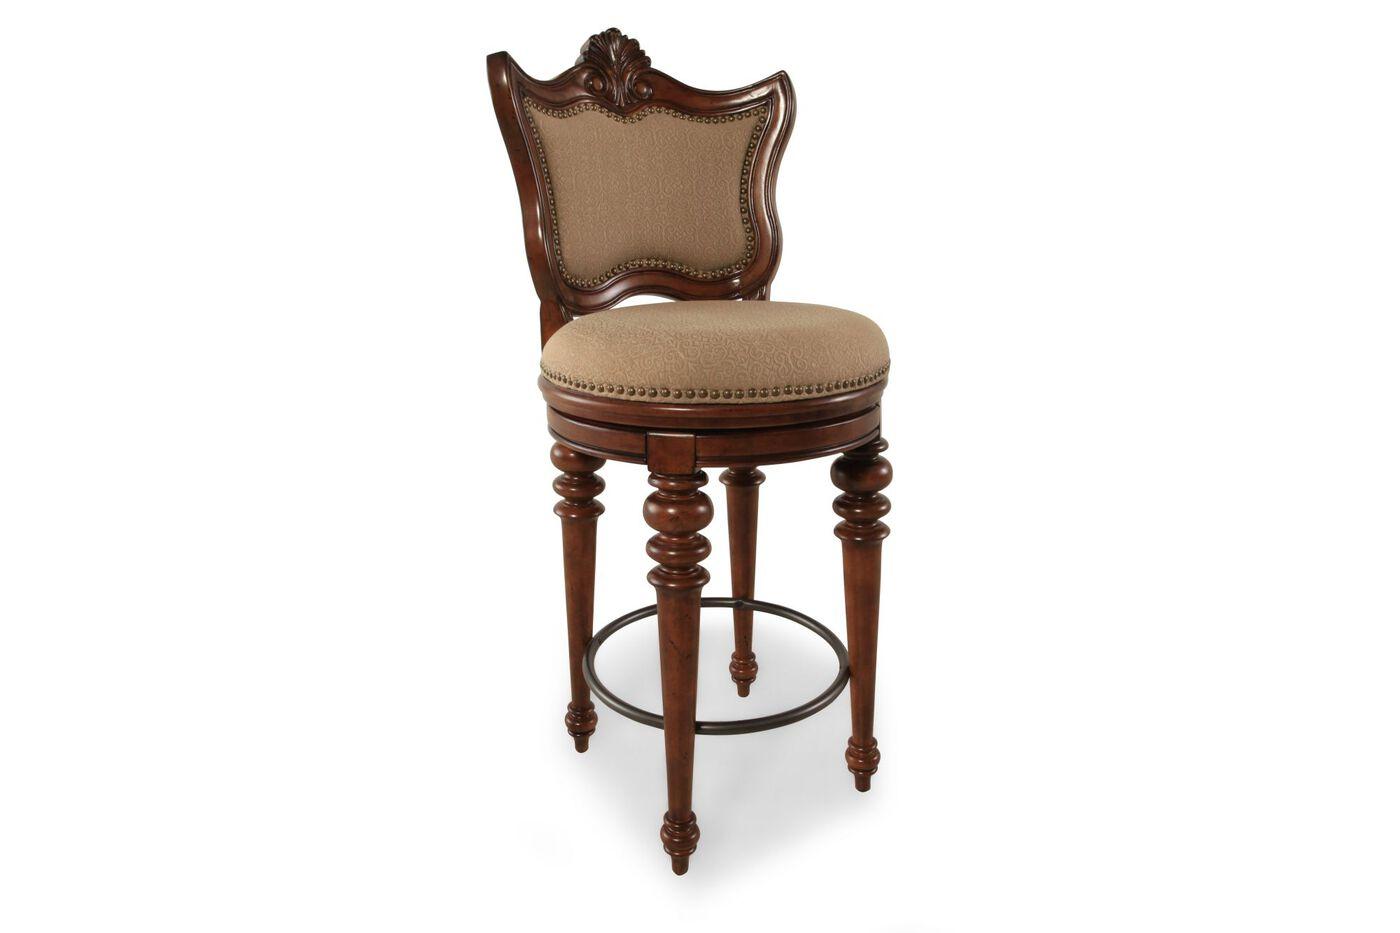 Pulaski Coronado Estates Bar Stool Mathis Brothers Furniture : PUL 665501 1 from www.mathisbrothers.com size 1400 x 933 jpeg 53kB